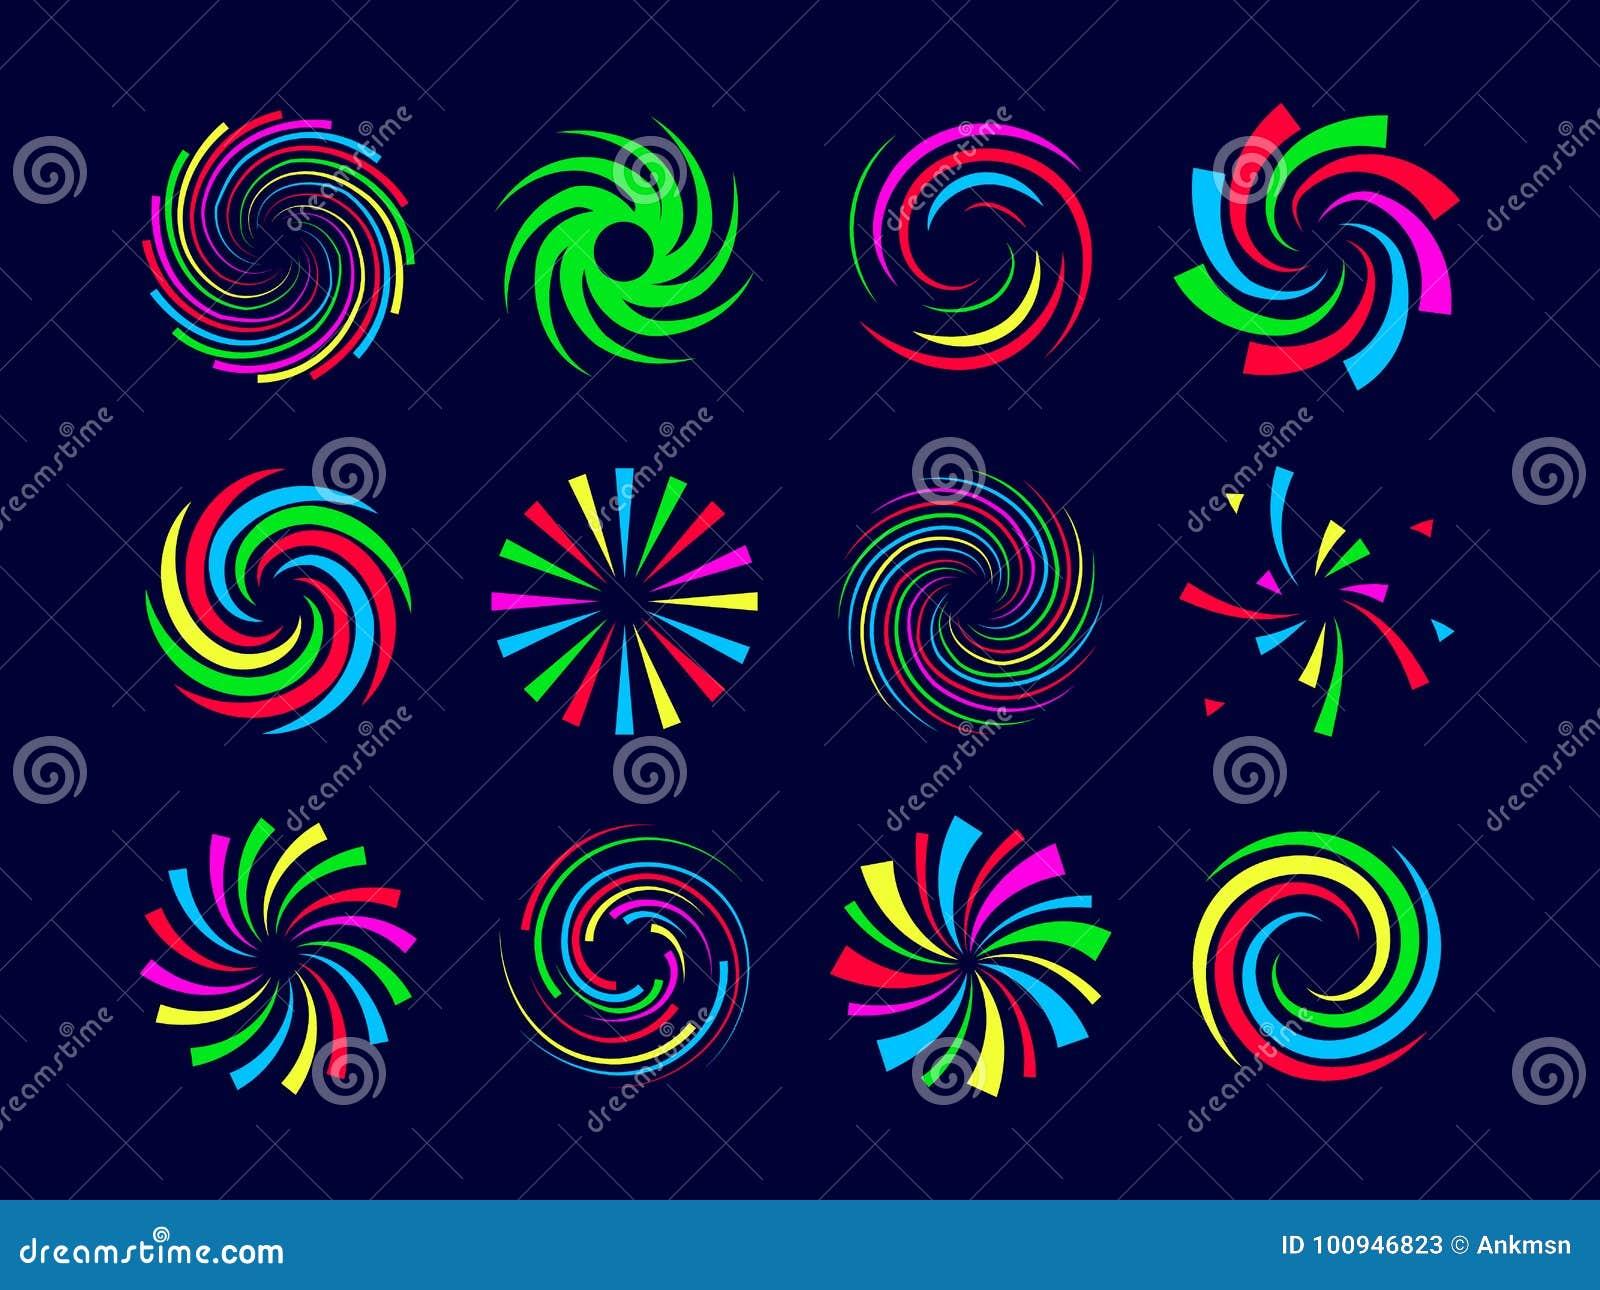 Colorful festive spirals twist and swirls fireworks set